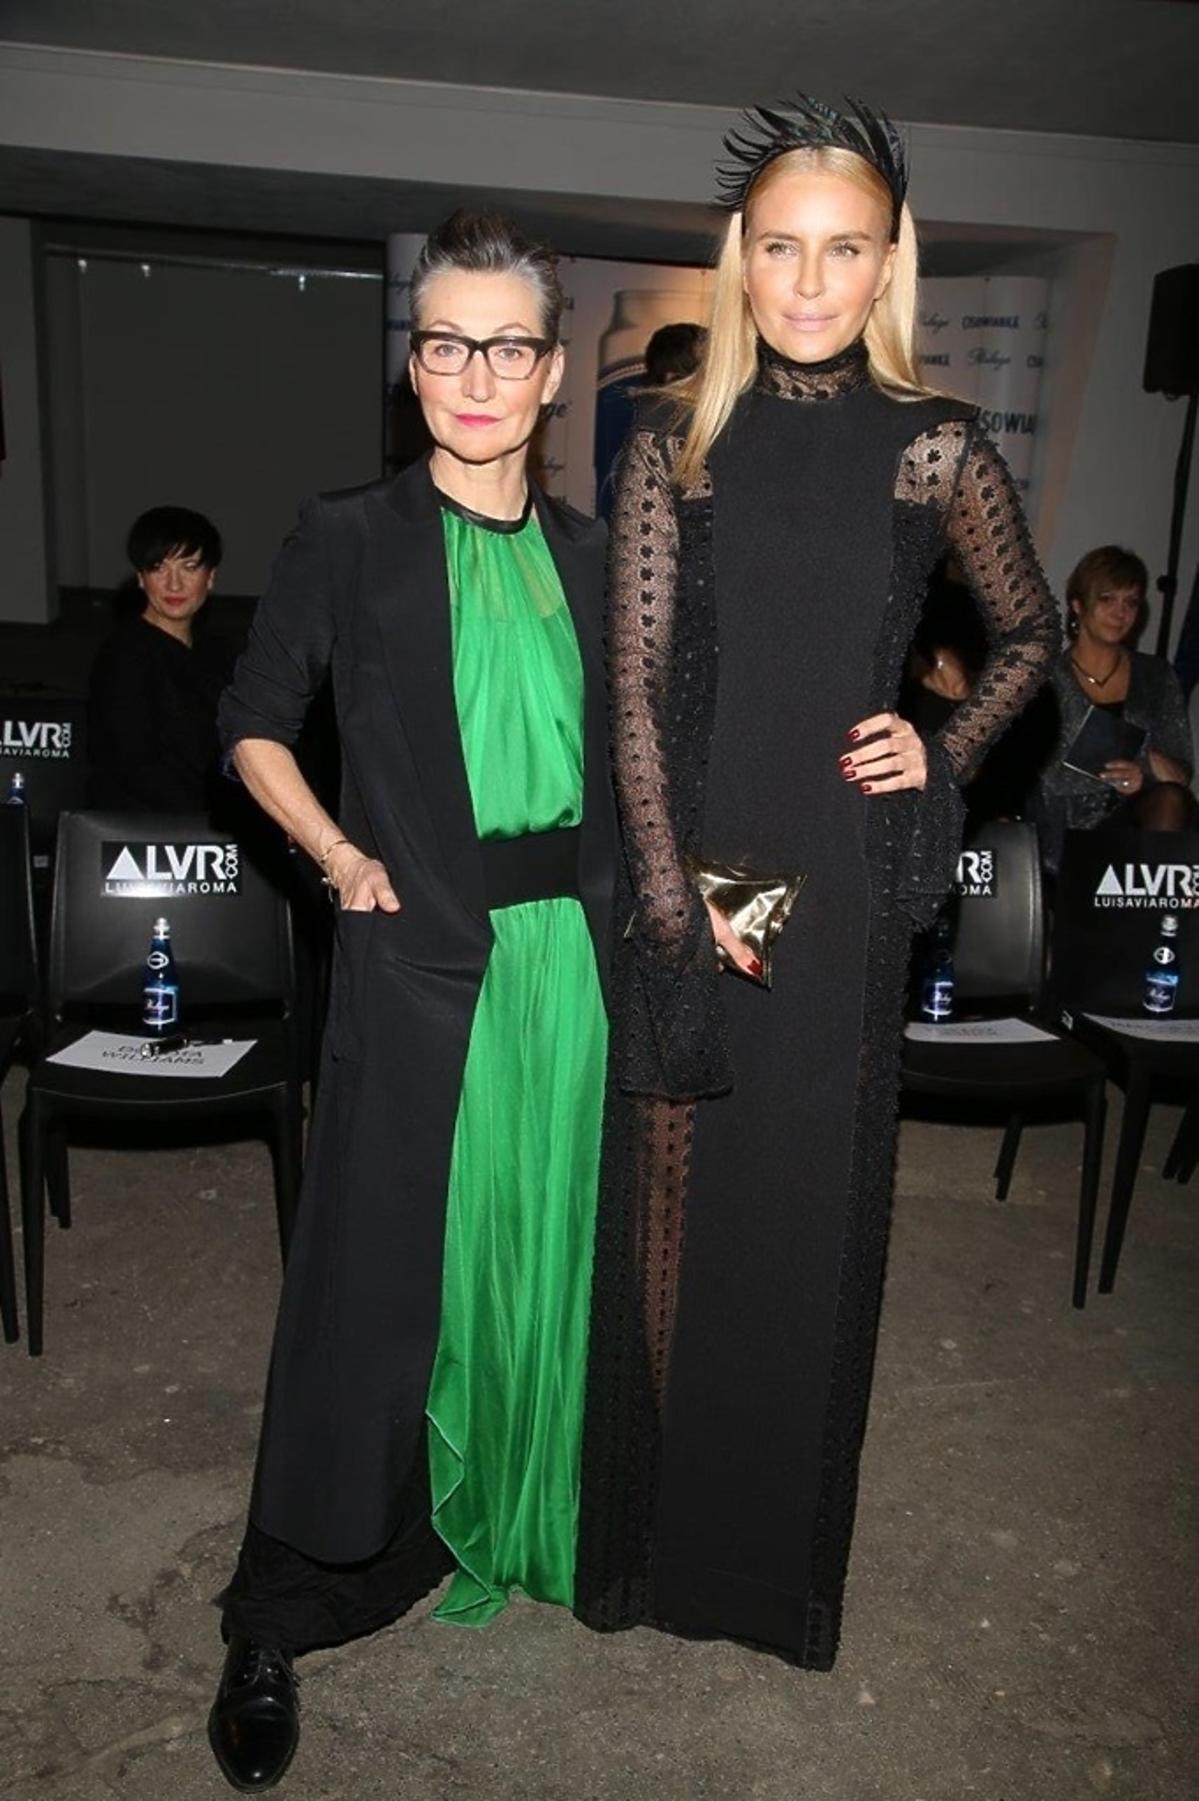 Joanna Horodyńska i Joanna Klimas na gali Flesz Fashion Night